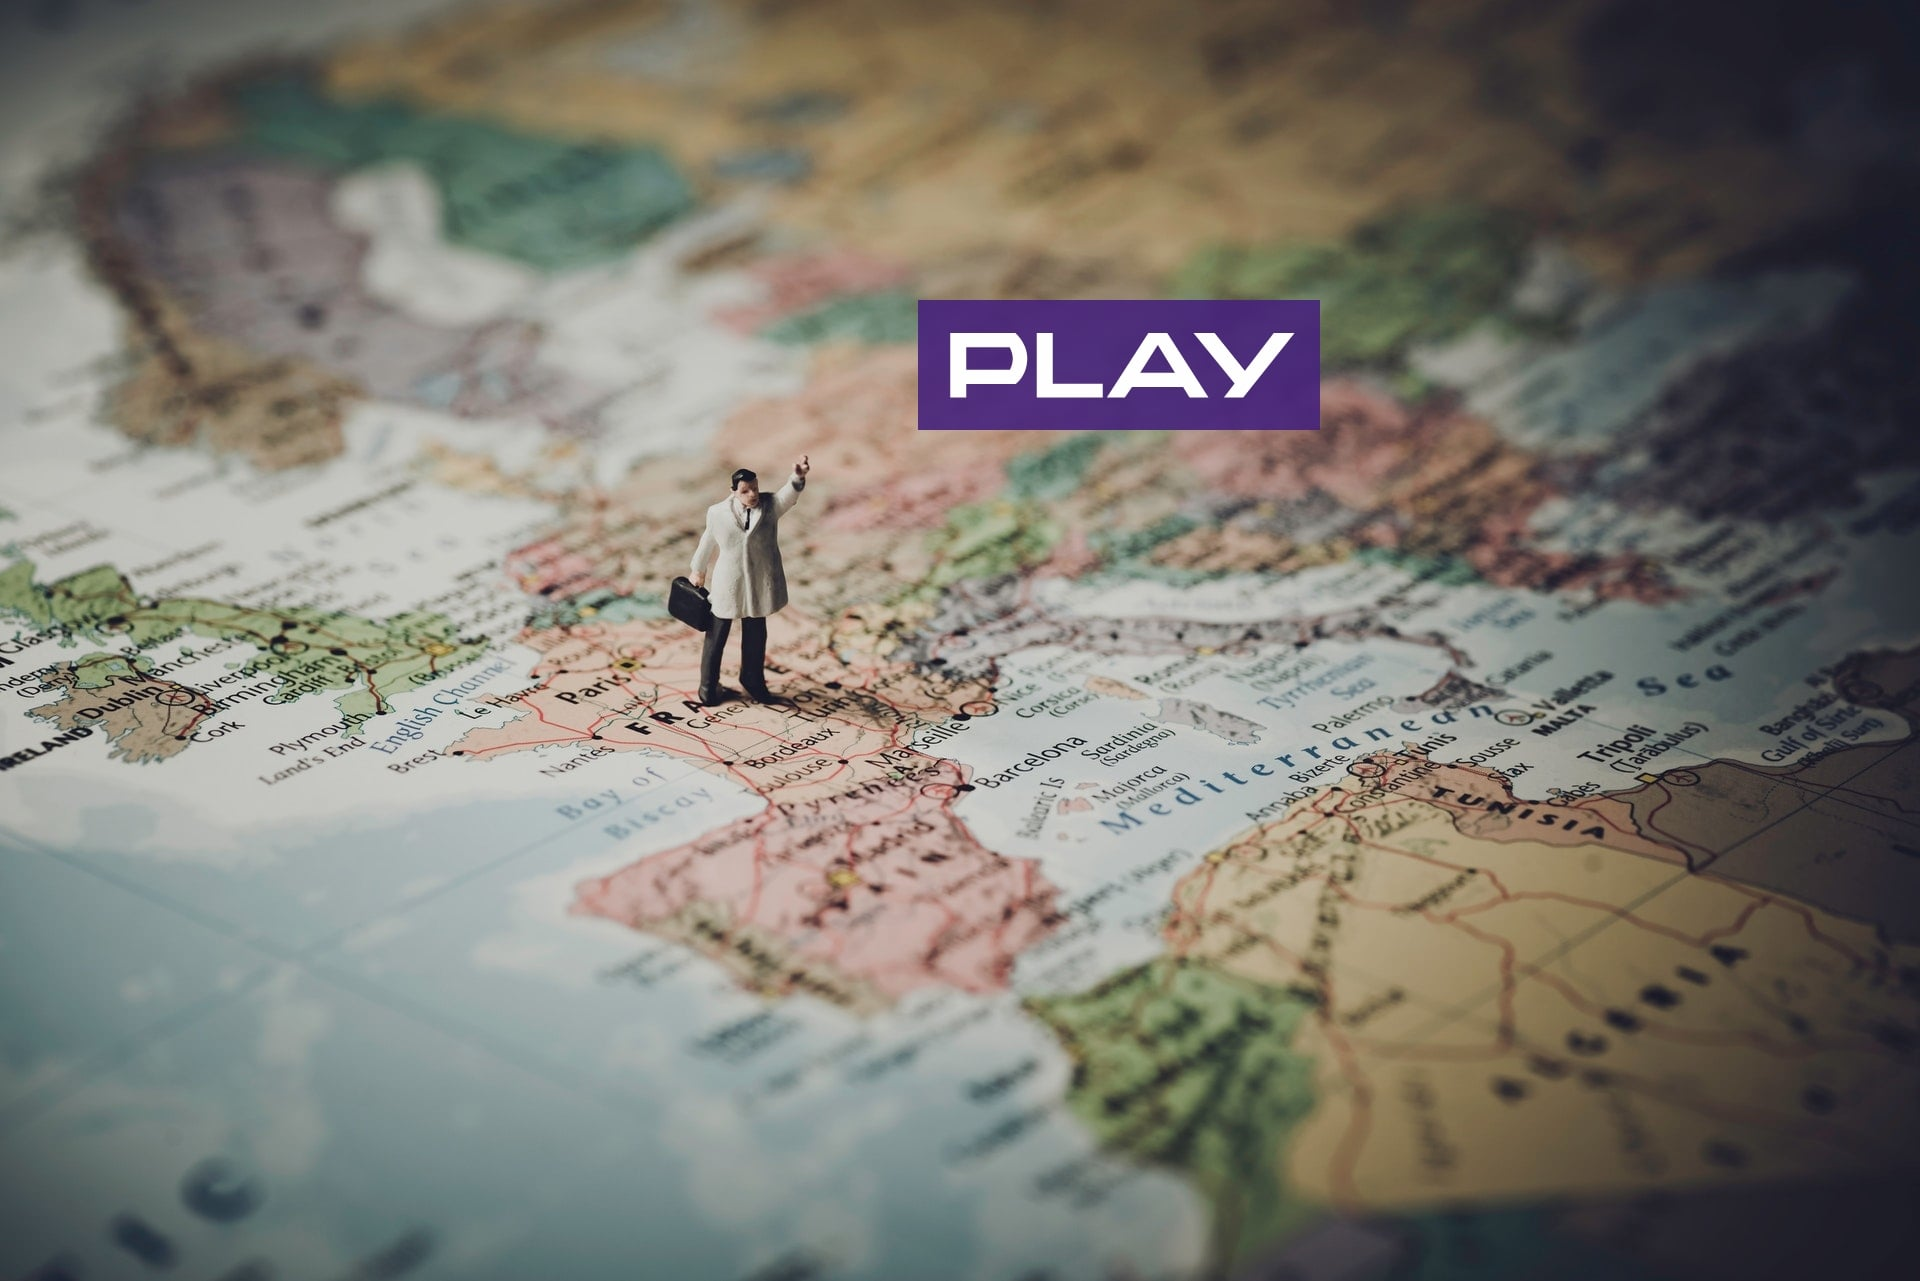 Europa Unia Europejska Play logo